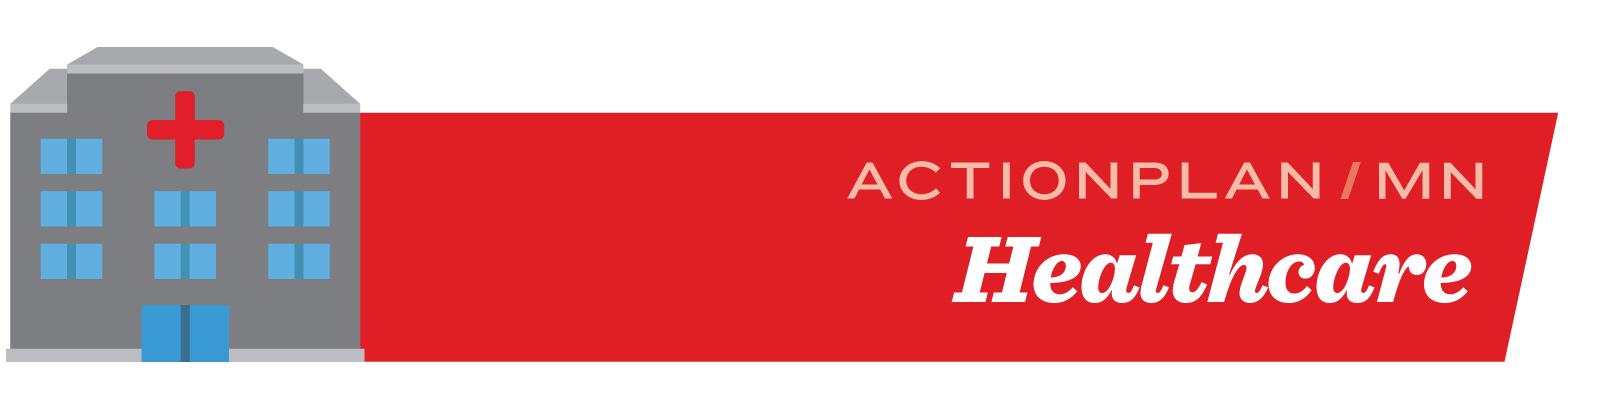 ActionPlanMN-6-Healthcare-b.jpg